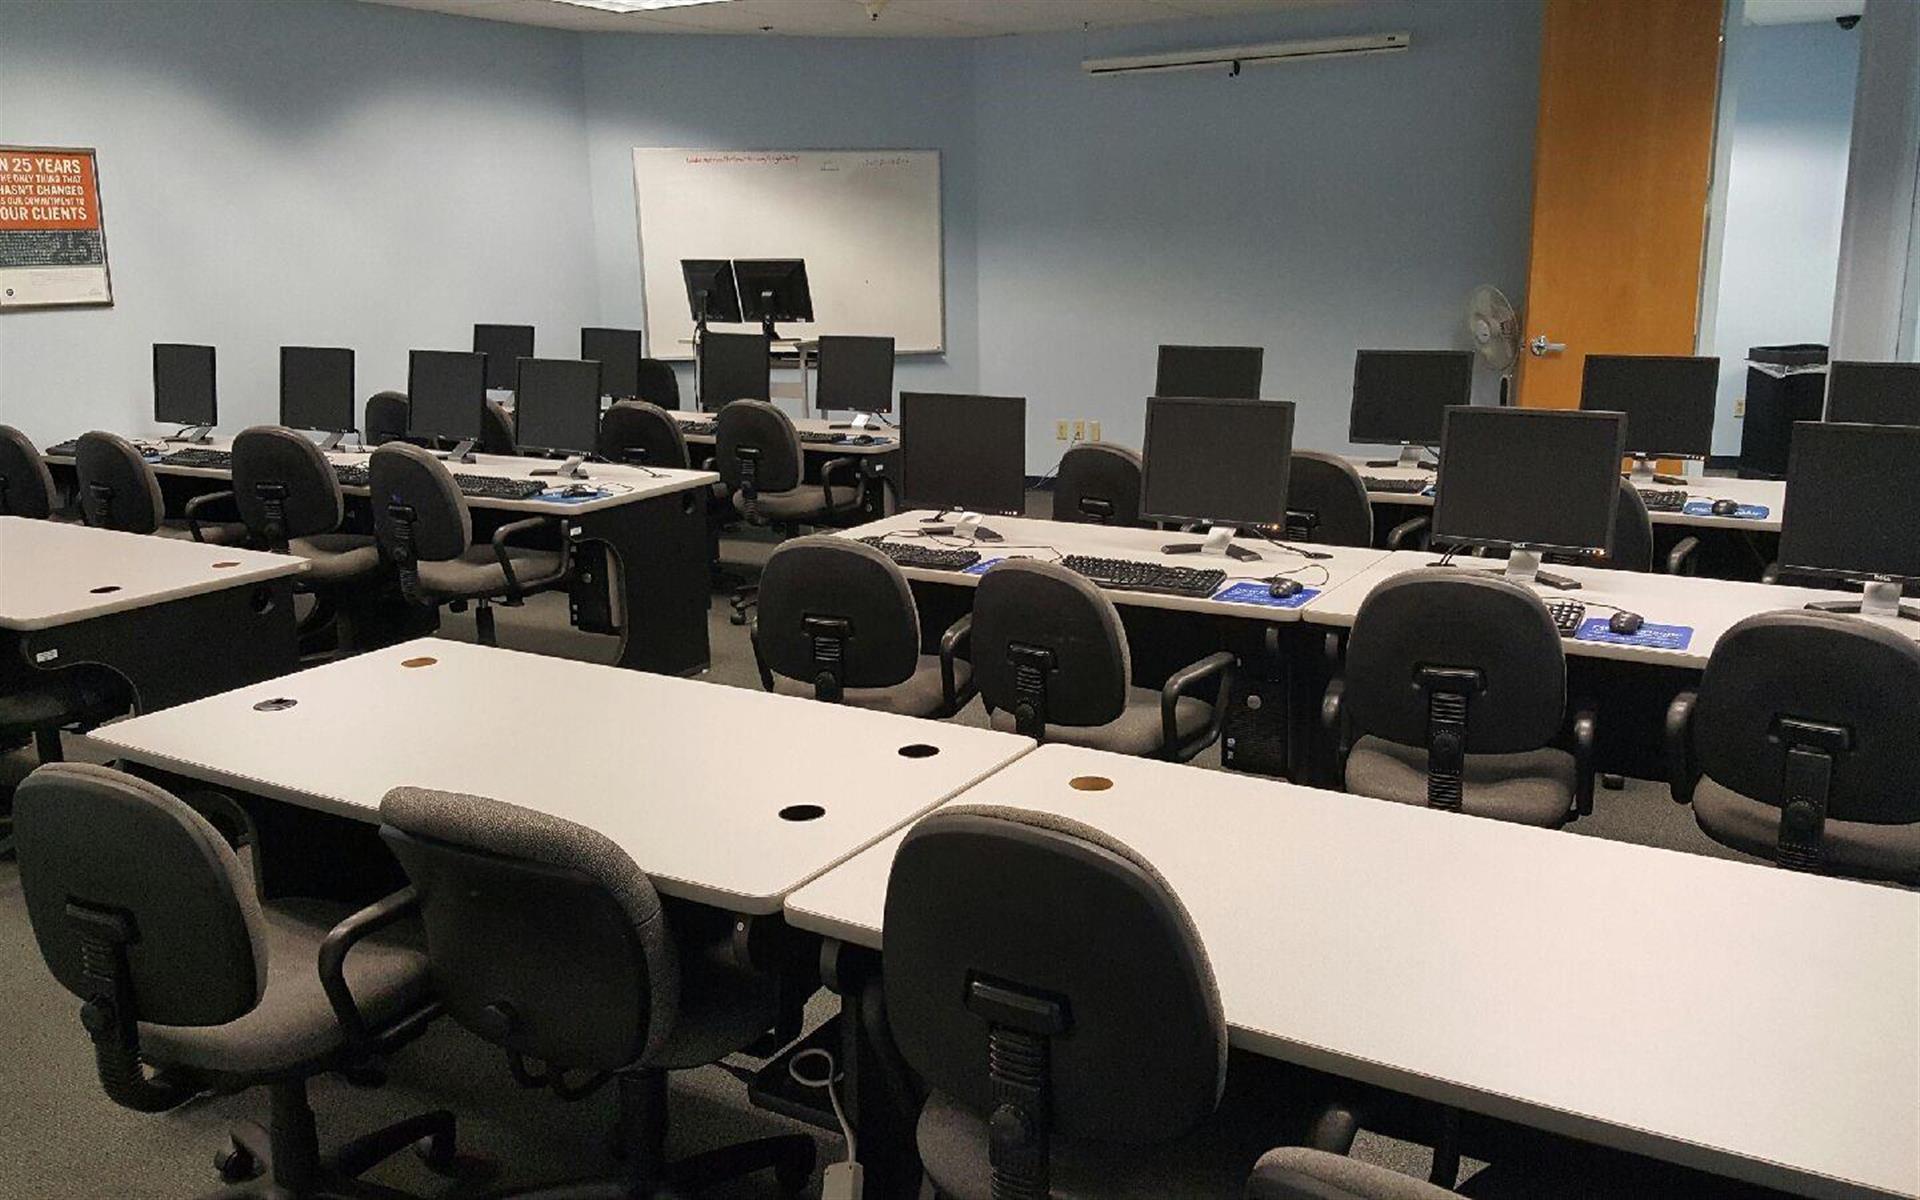 New Horizons Learning Group Sacramento - Room 7